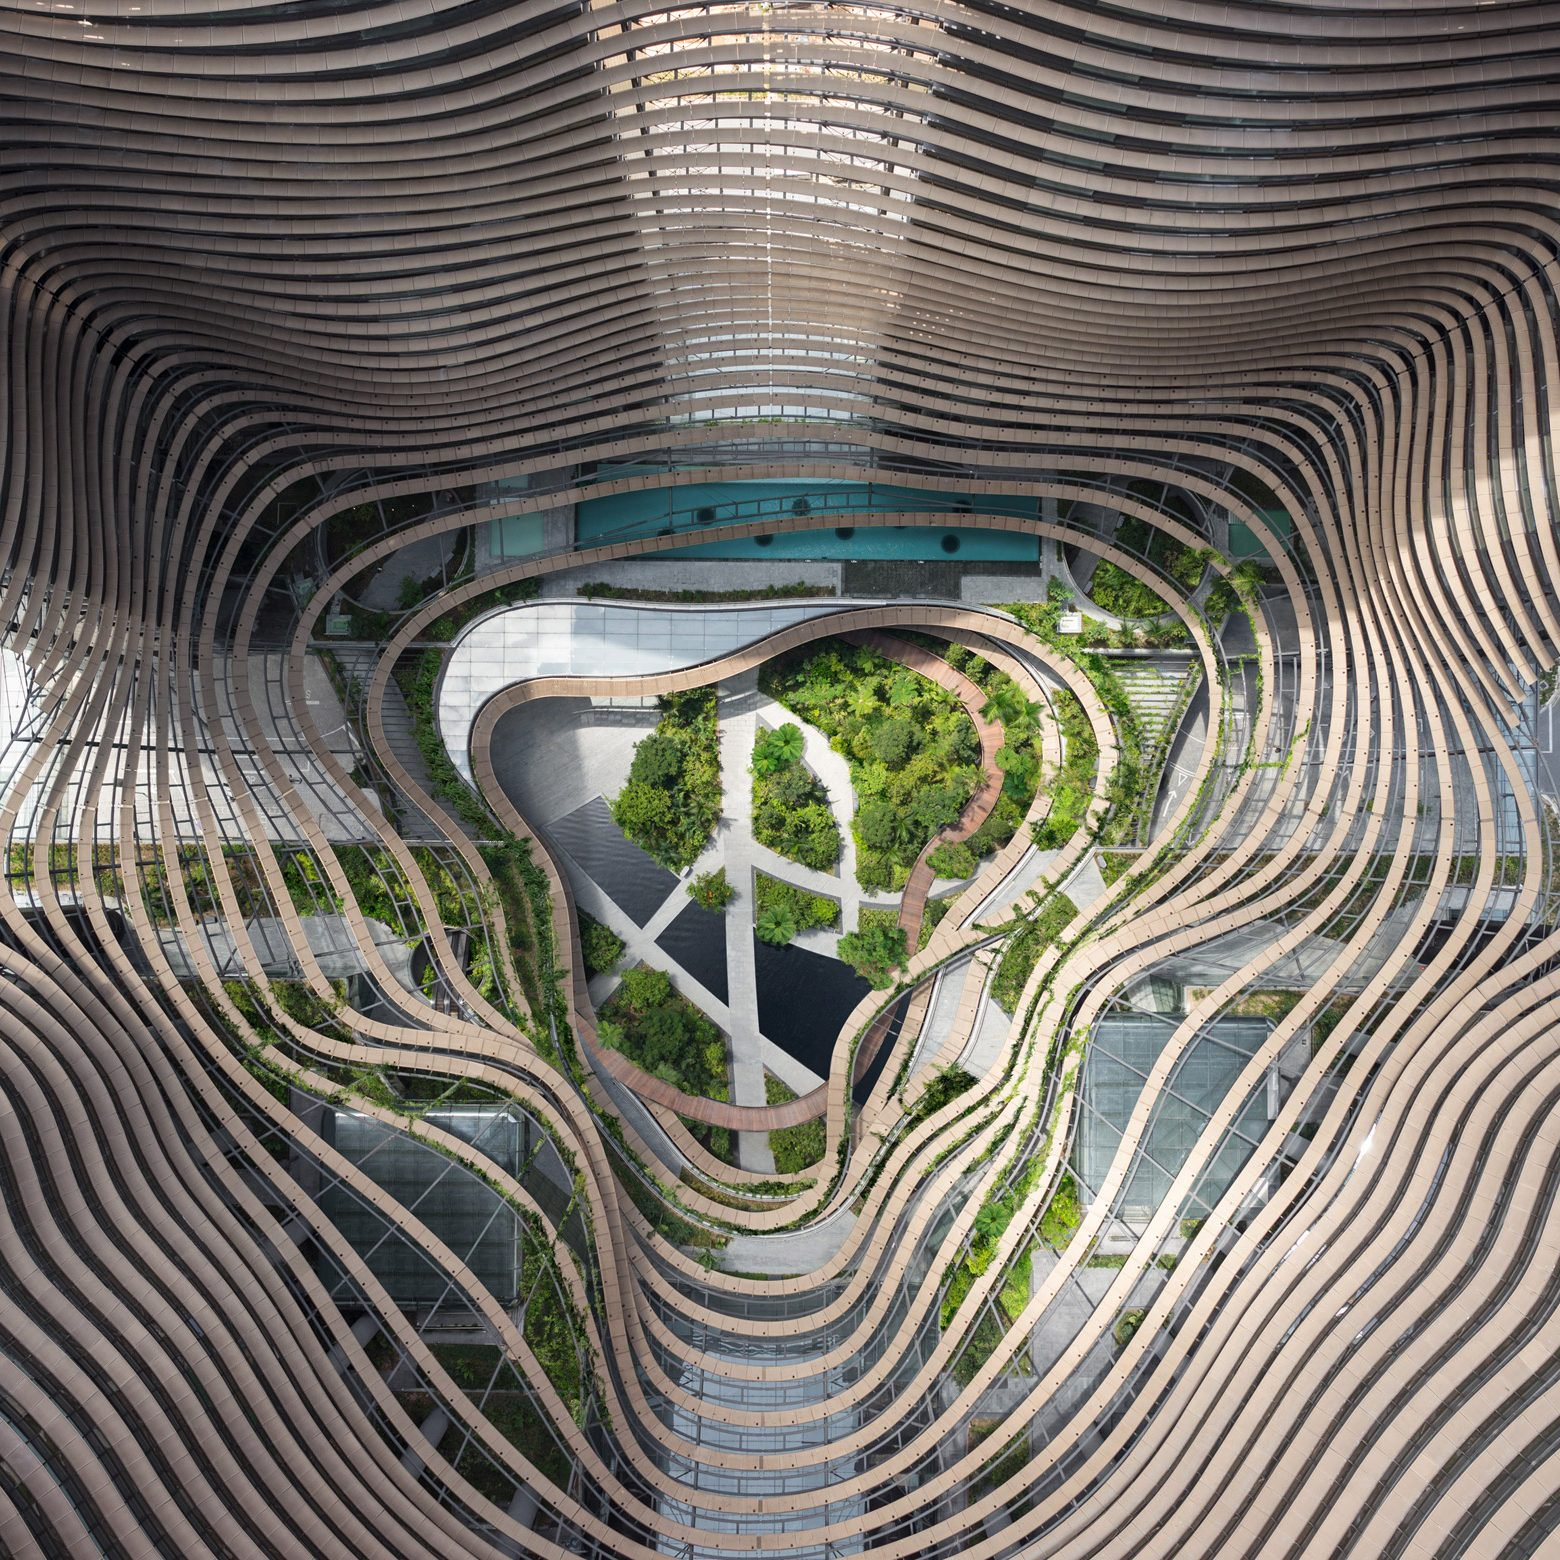 marina-one-ingenhoven-architects-landscape-urbanism-singapore_dezeen_2364_col_0-e1512474978744.jpg